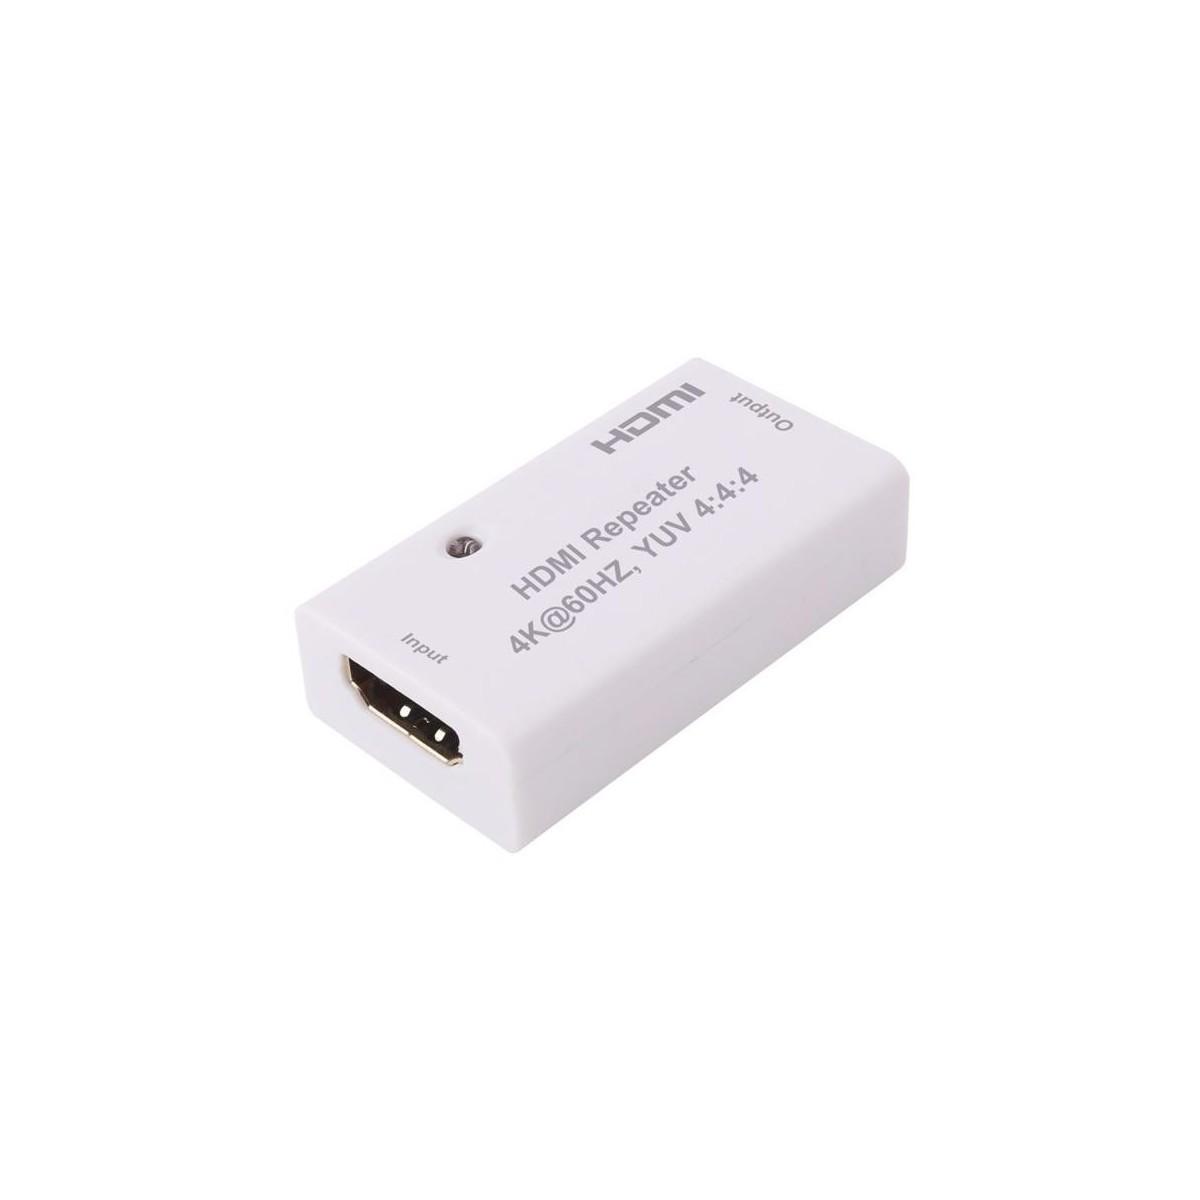 Signalverstärker PROFI HDMI 2.0 REPEATER